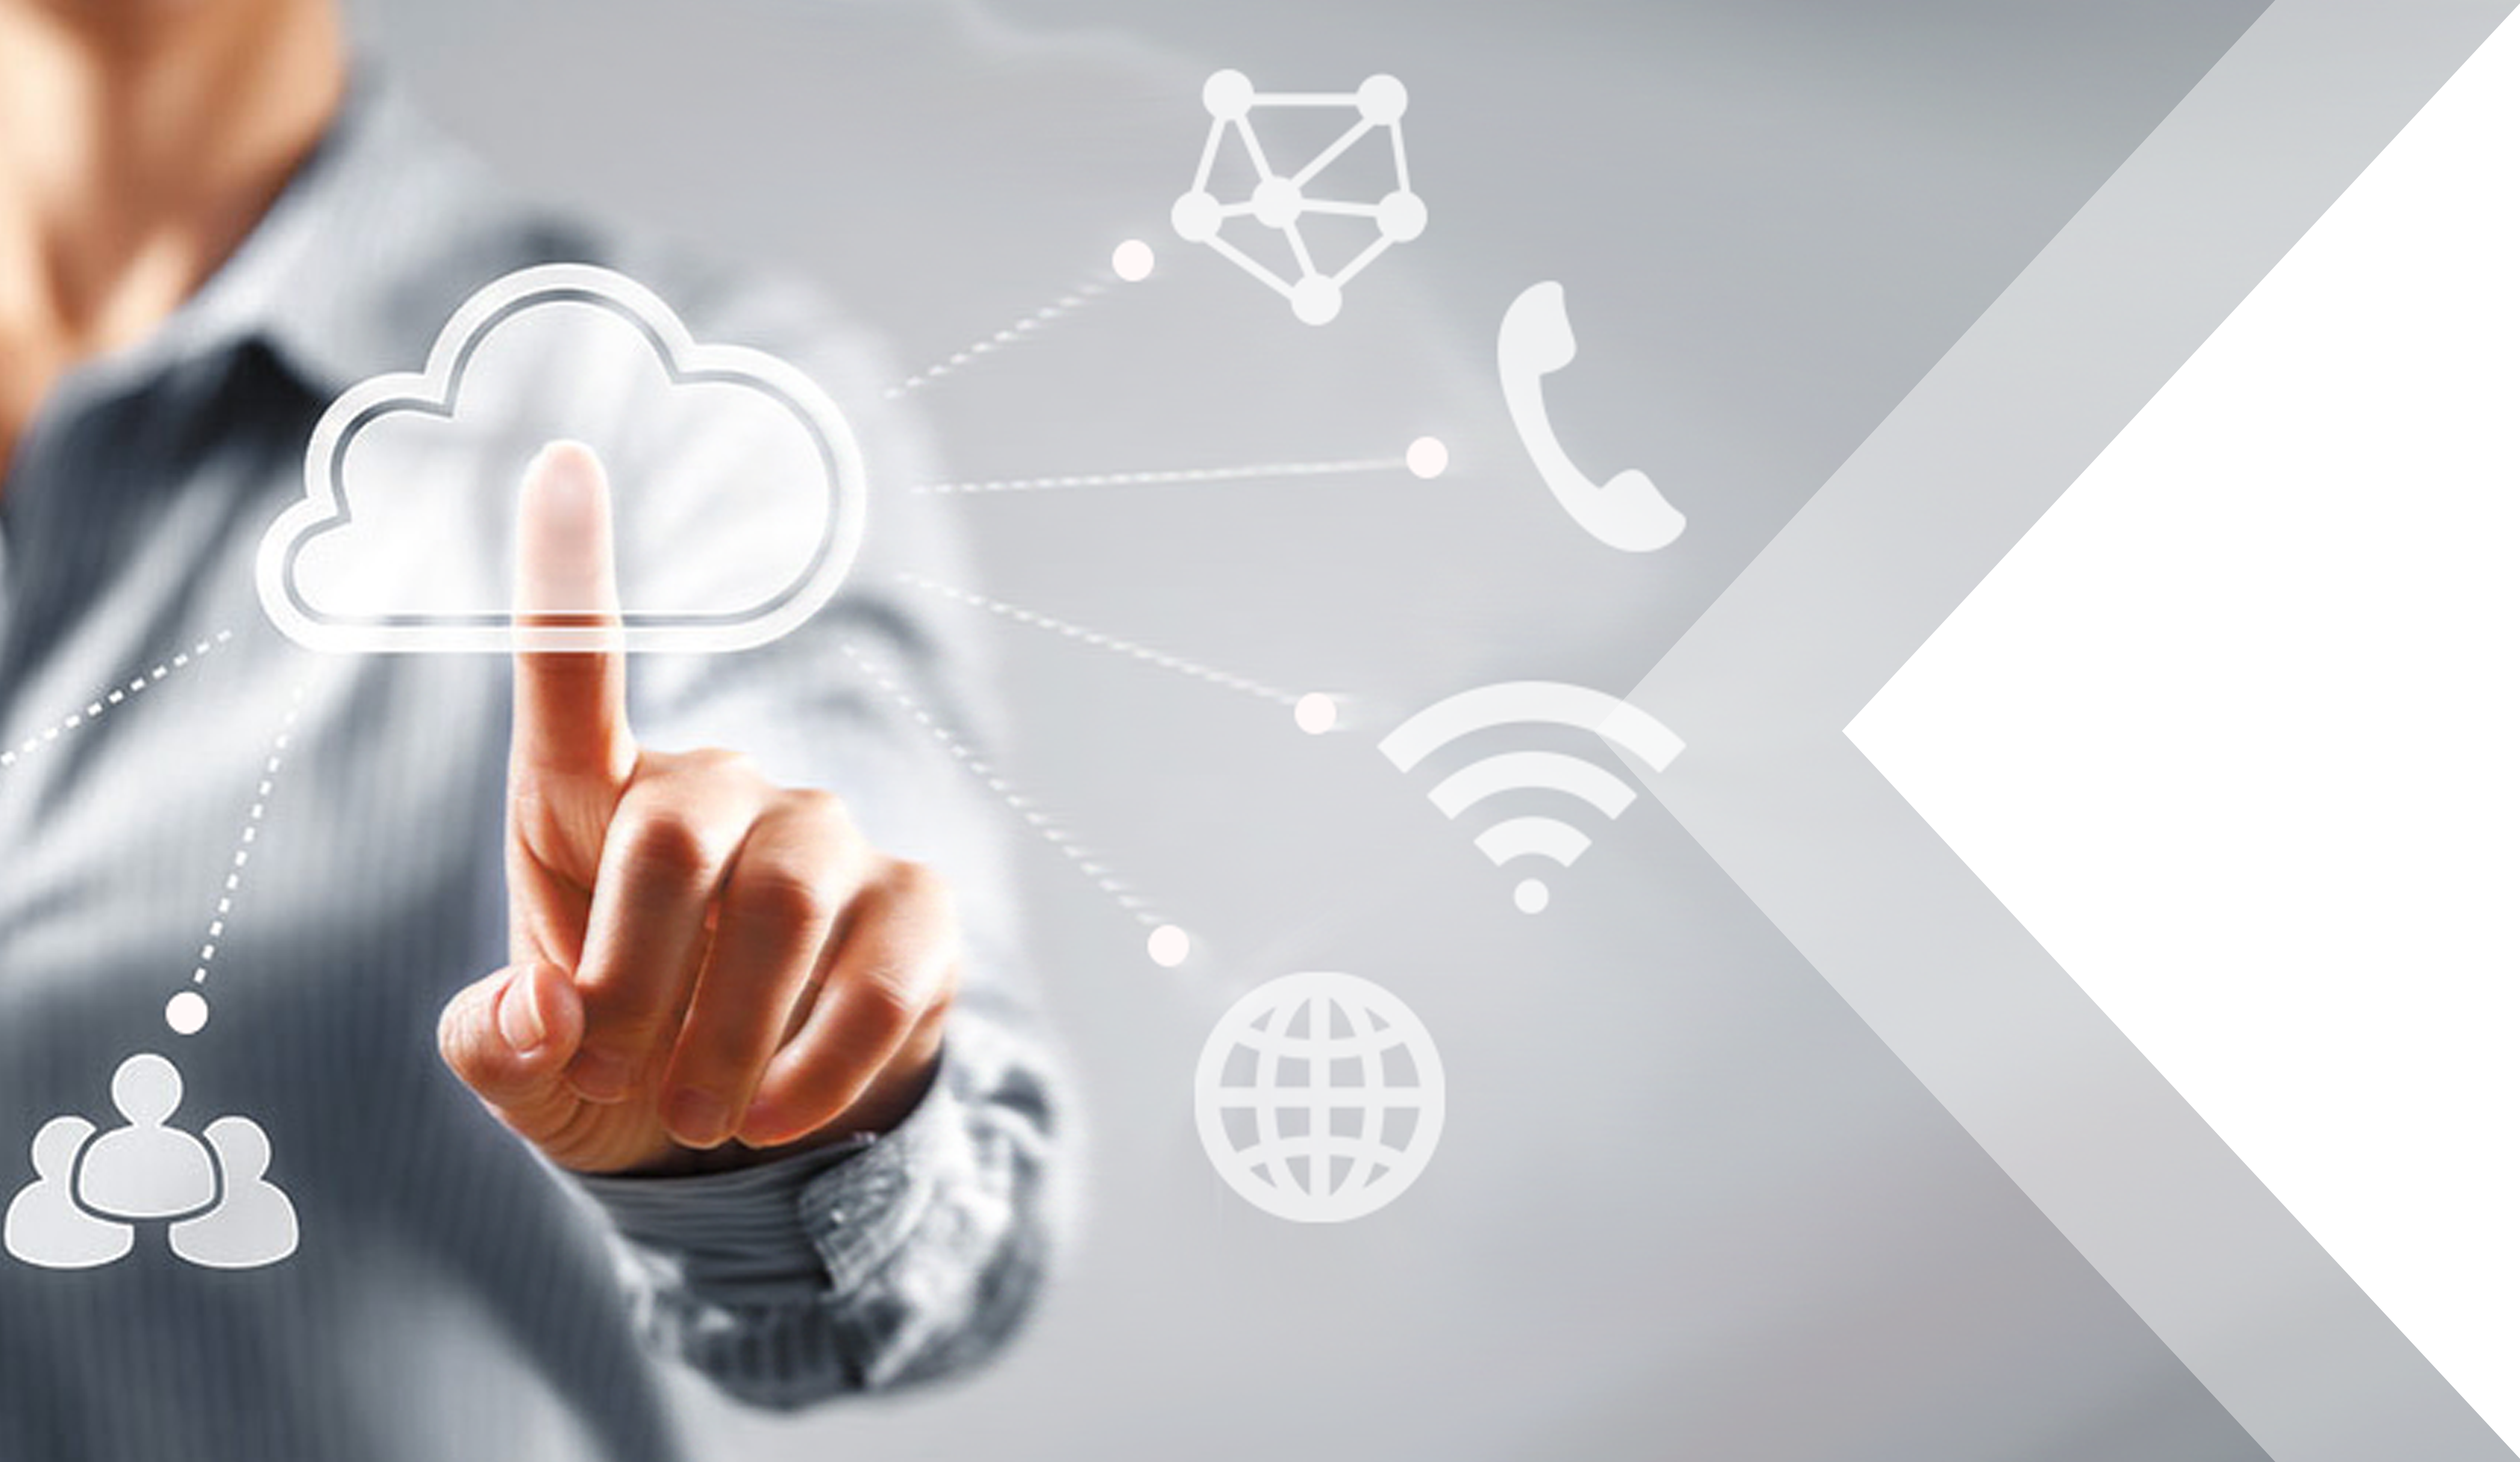 Matrix Networks Partner Page. Mitel, ShoreTel, RingCentral, 8x8, Meraki, Cisco